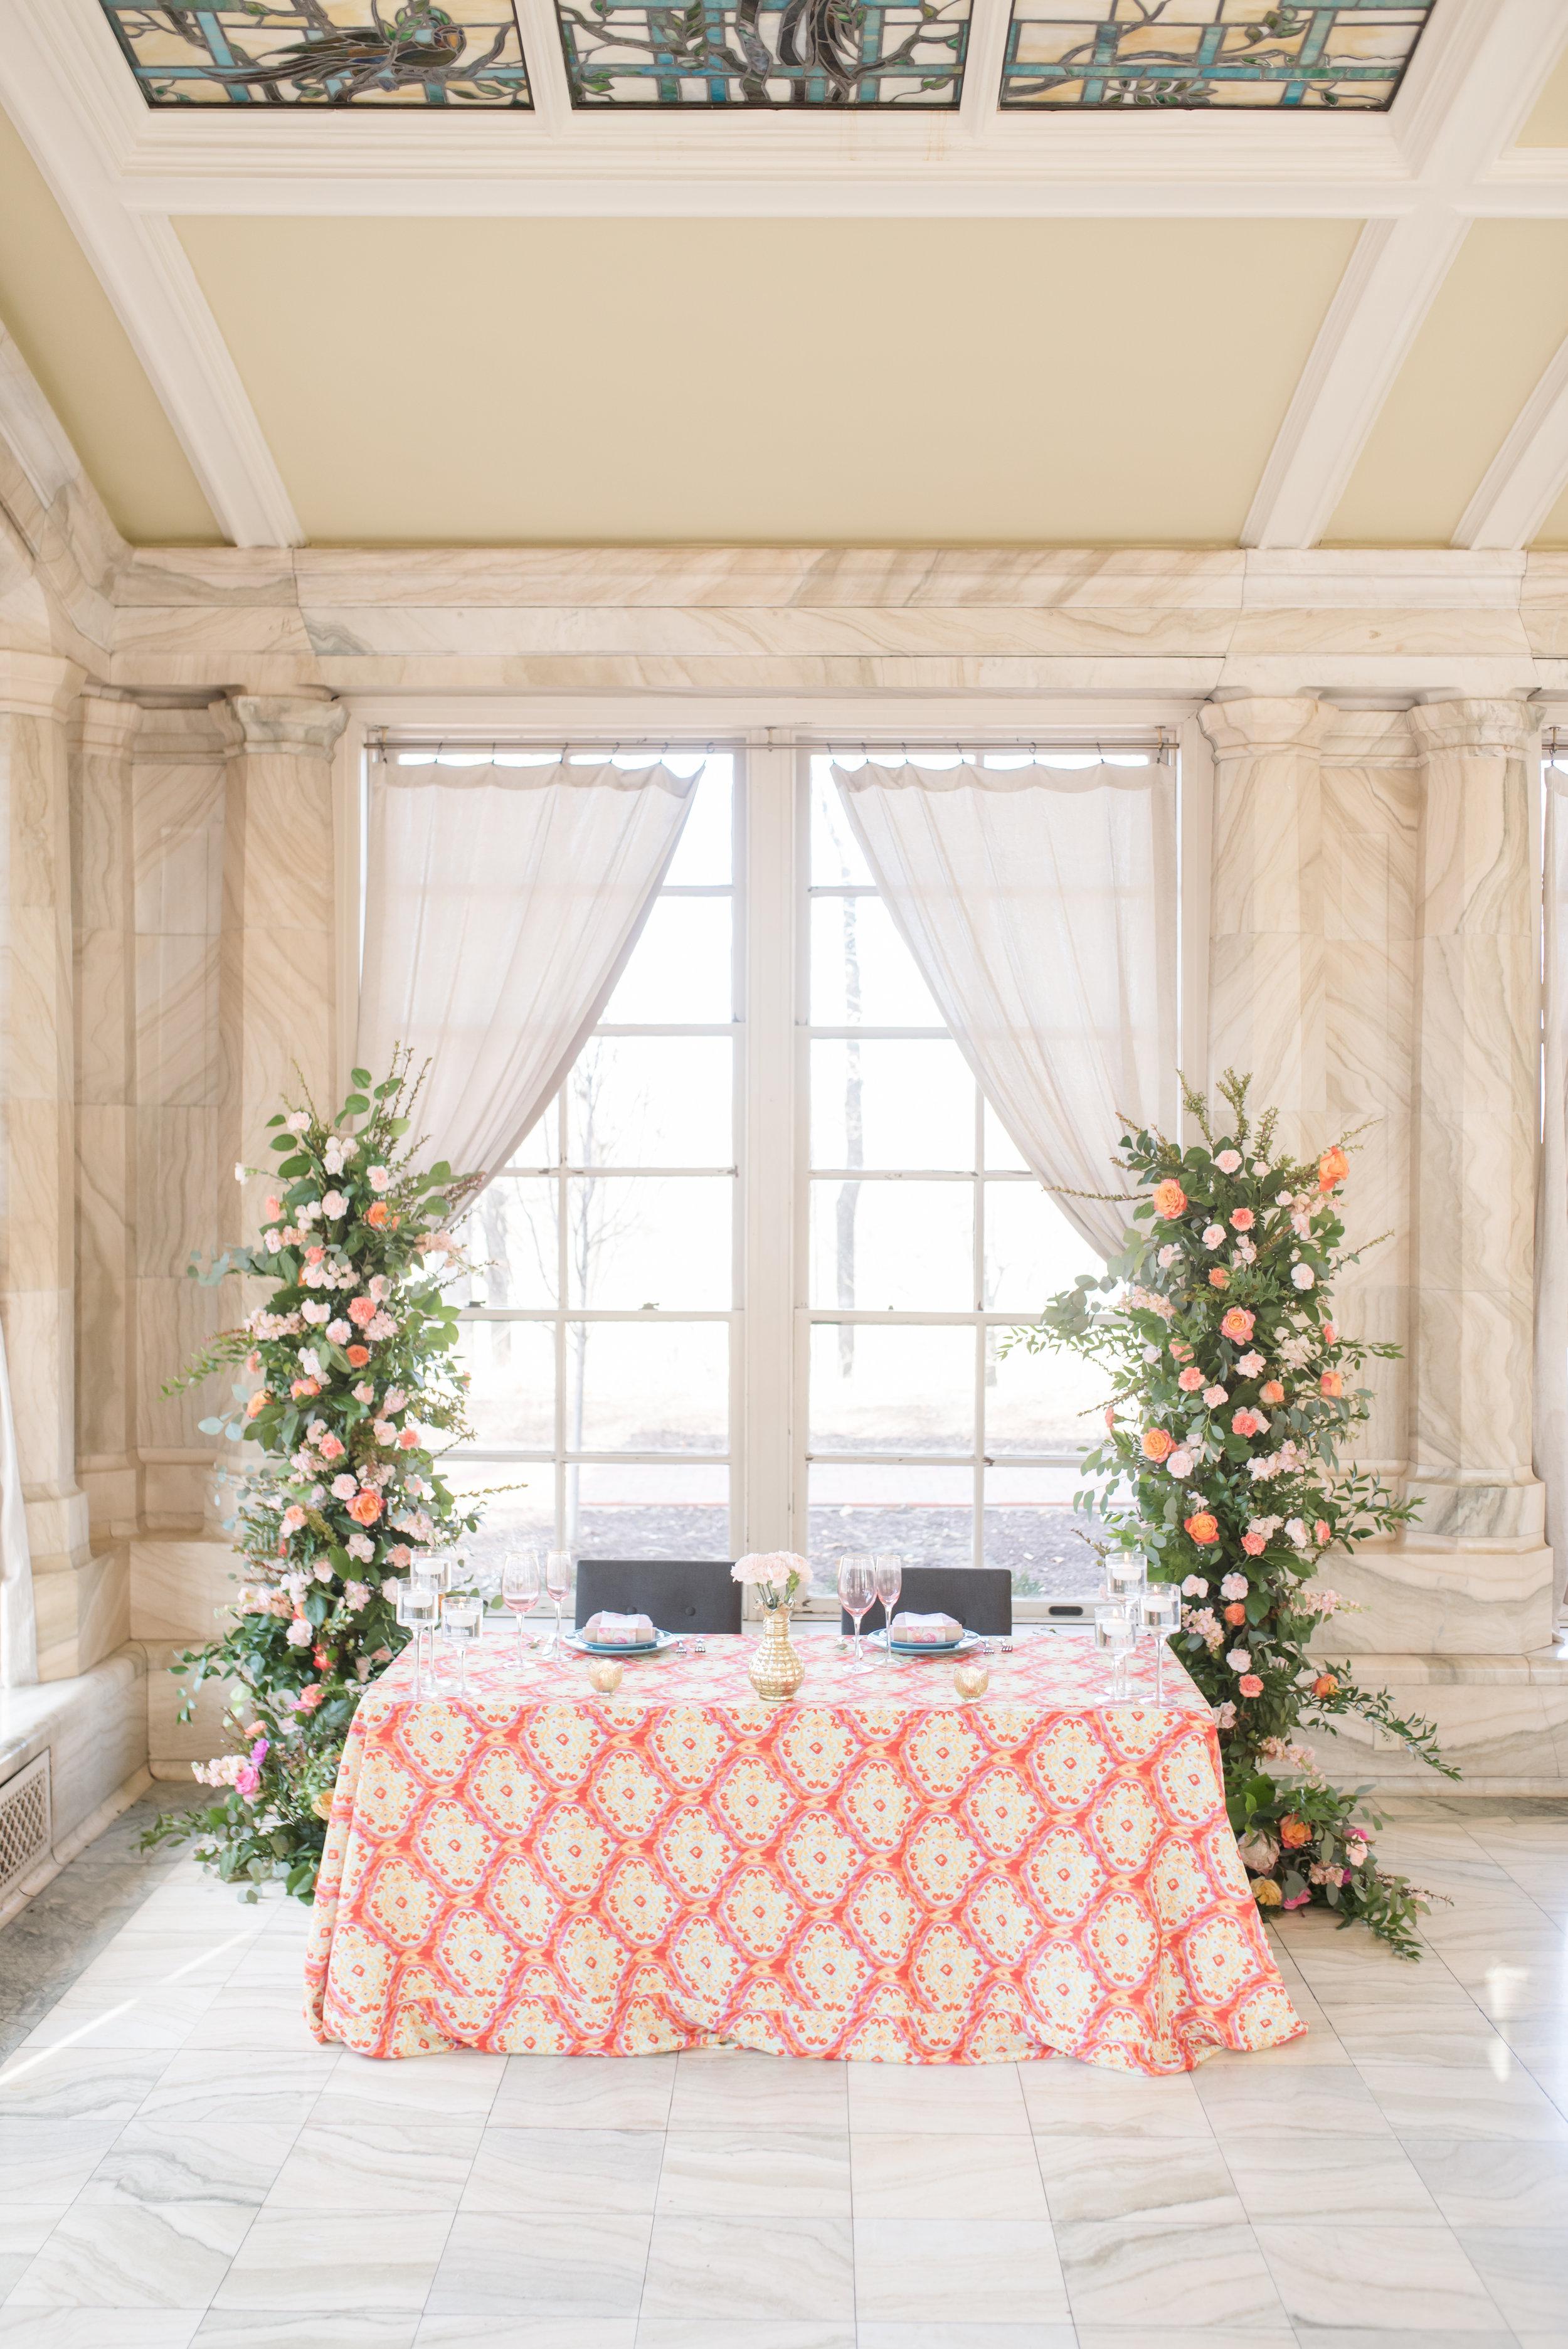 Best Wedding Venues in Indianapolis